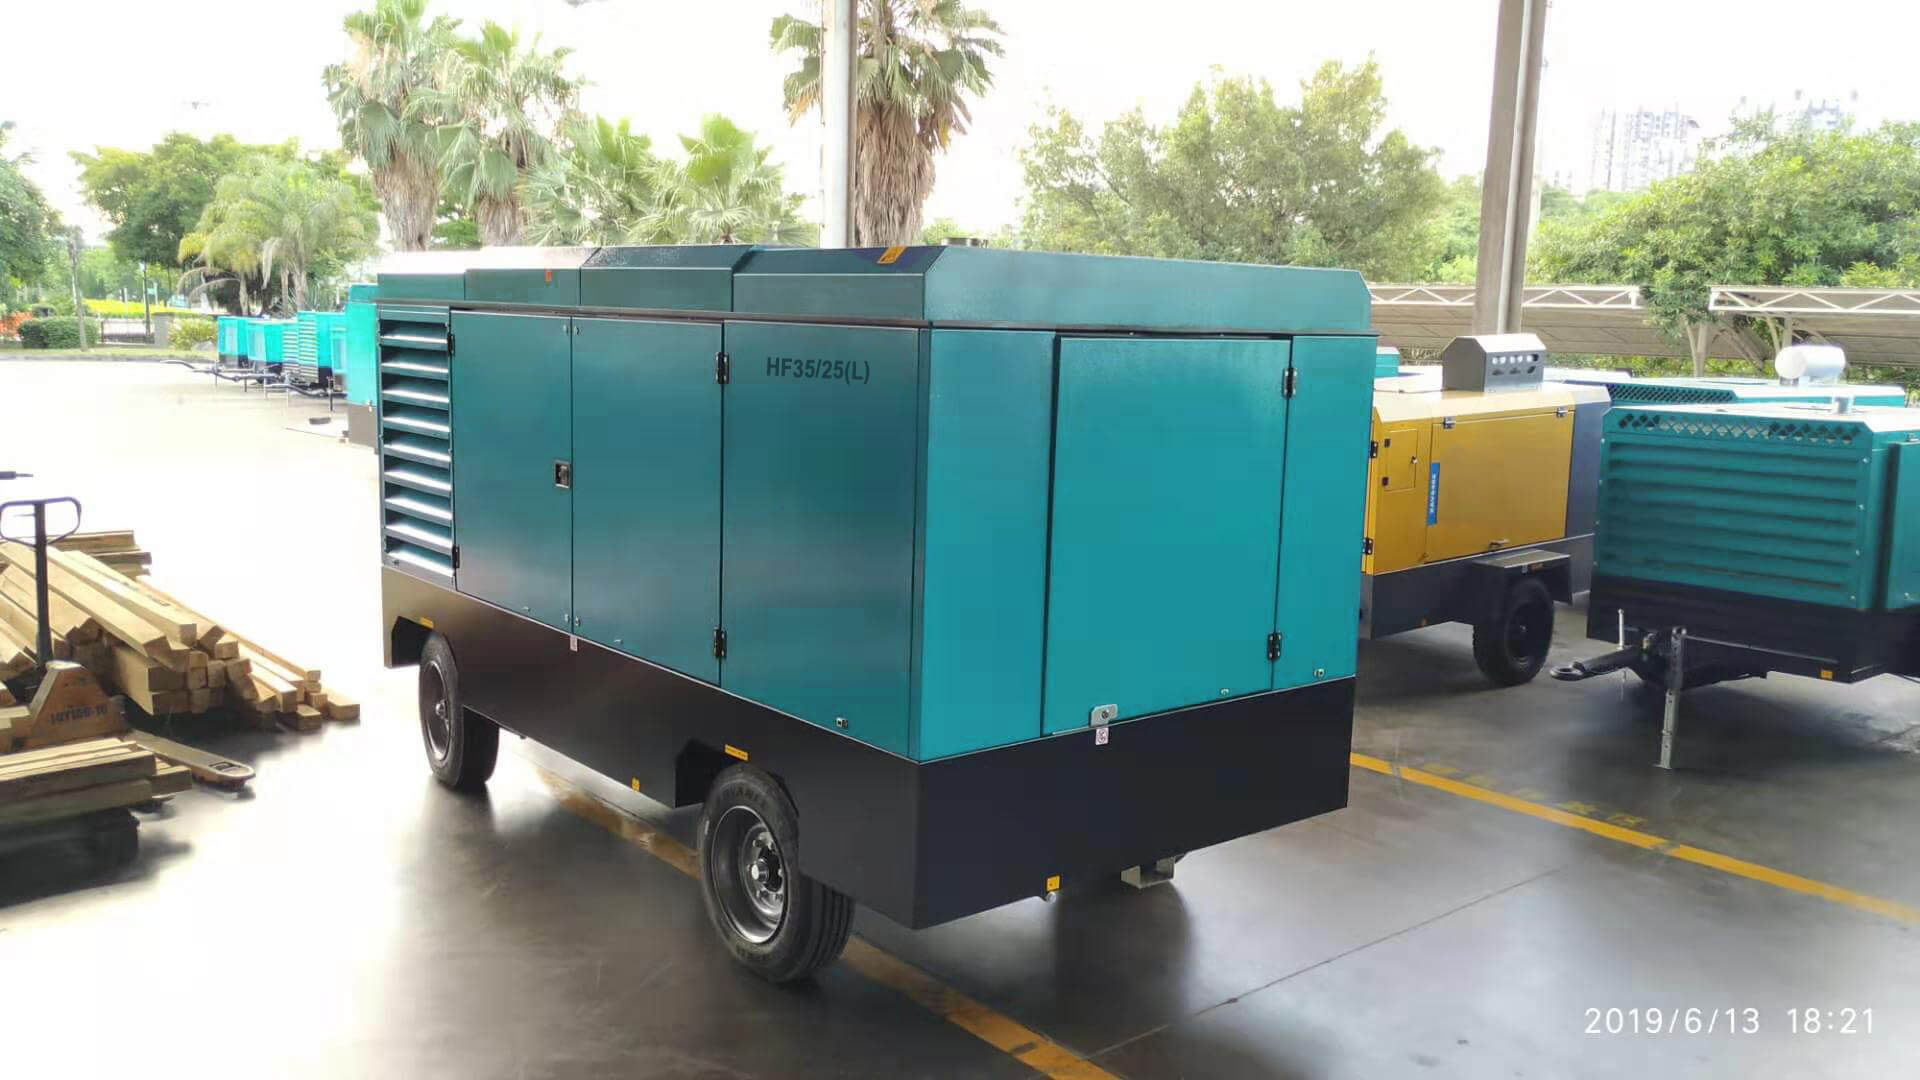 HF28/25 (L) Mobile Screw Air Compressor